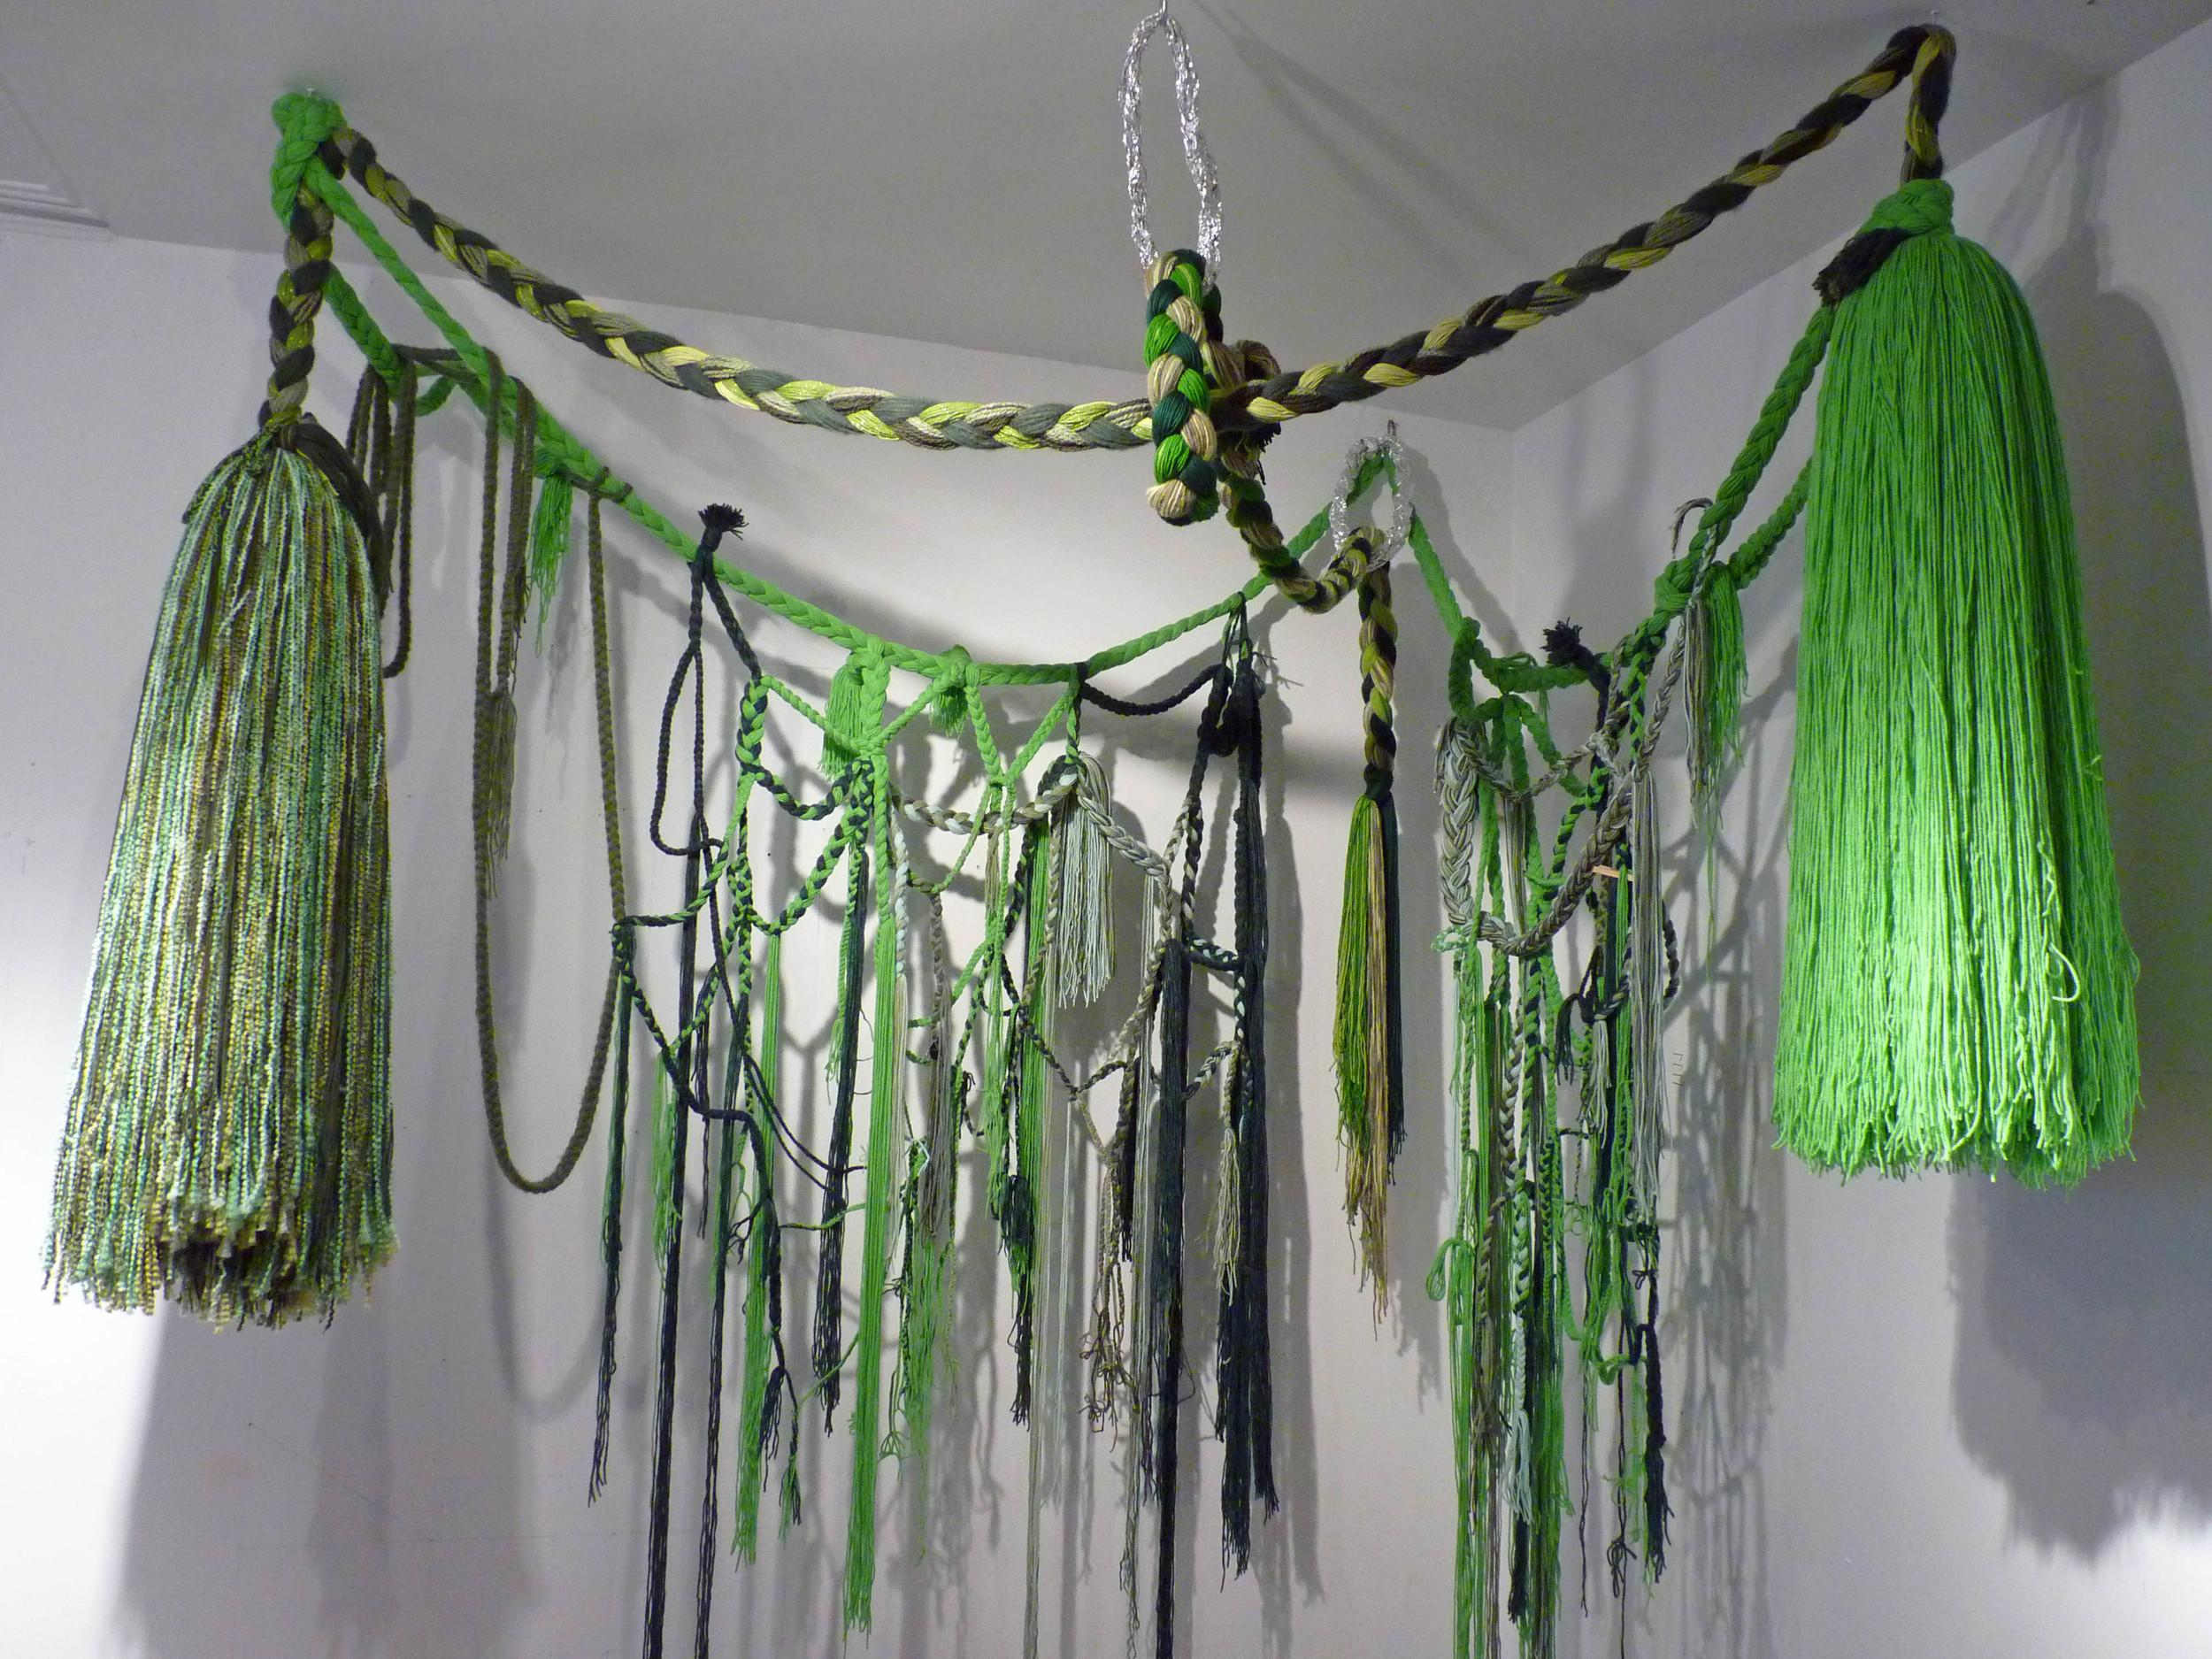 Green Piece, 2011, Acrylic yarn and tin foil, 7' x 8' x 9' (Studio view)